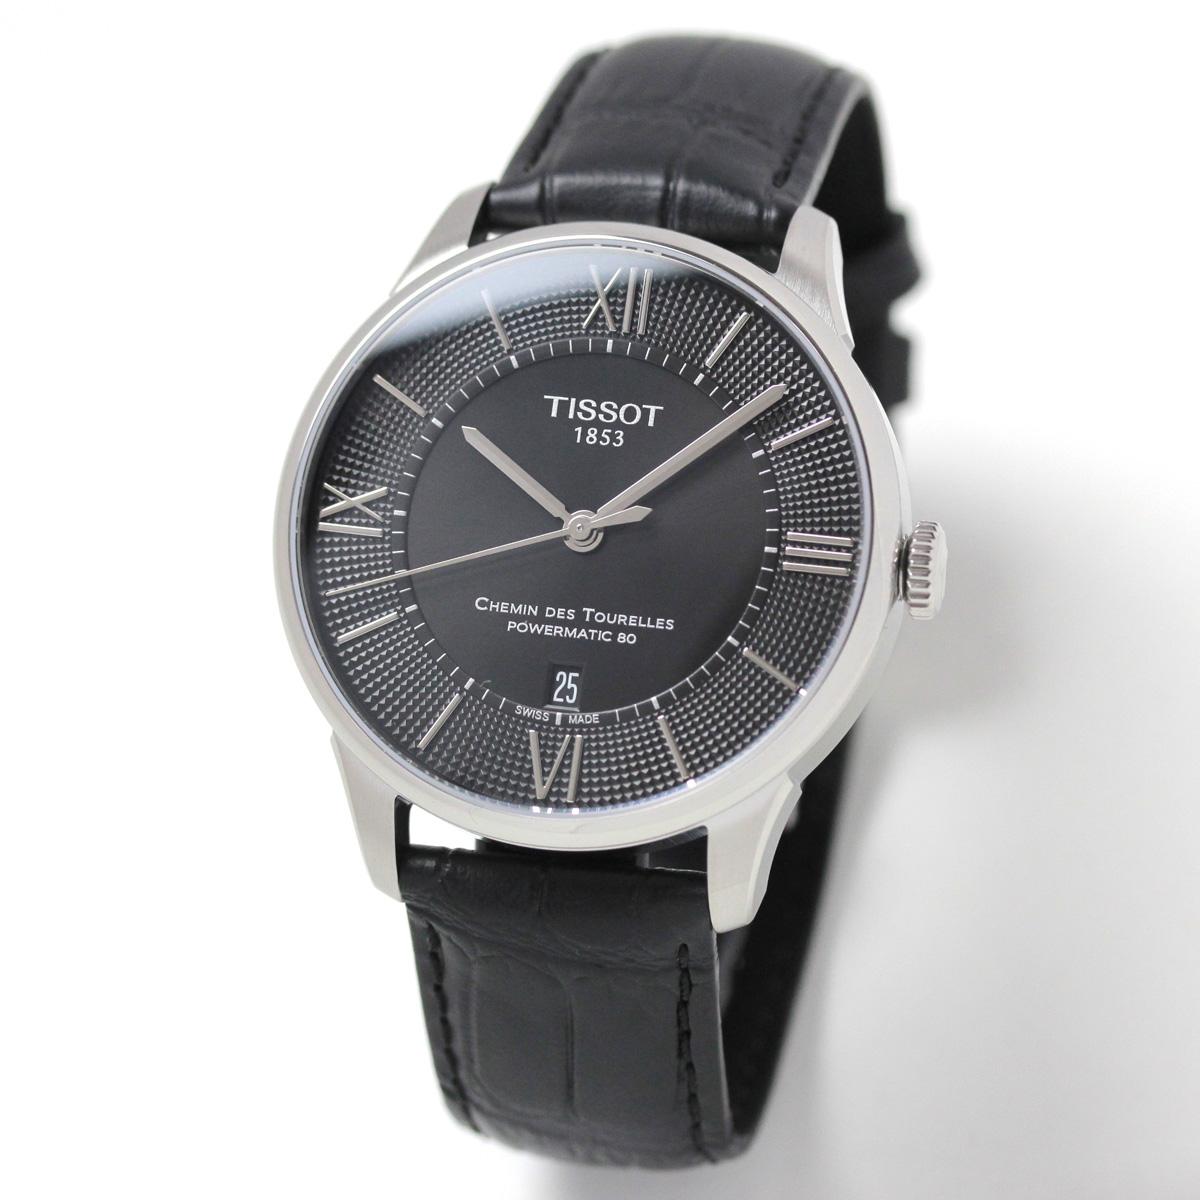 Tissot(ティソ) CHEMIN DES TOURELLES  (シャミン・ド・トゥレル )t0994071605800